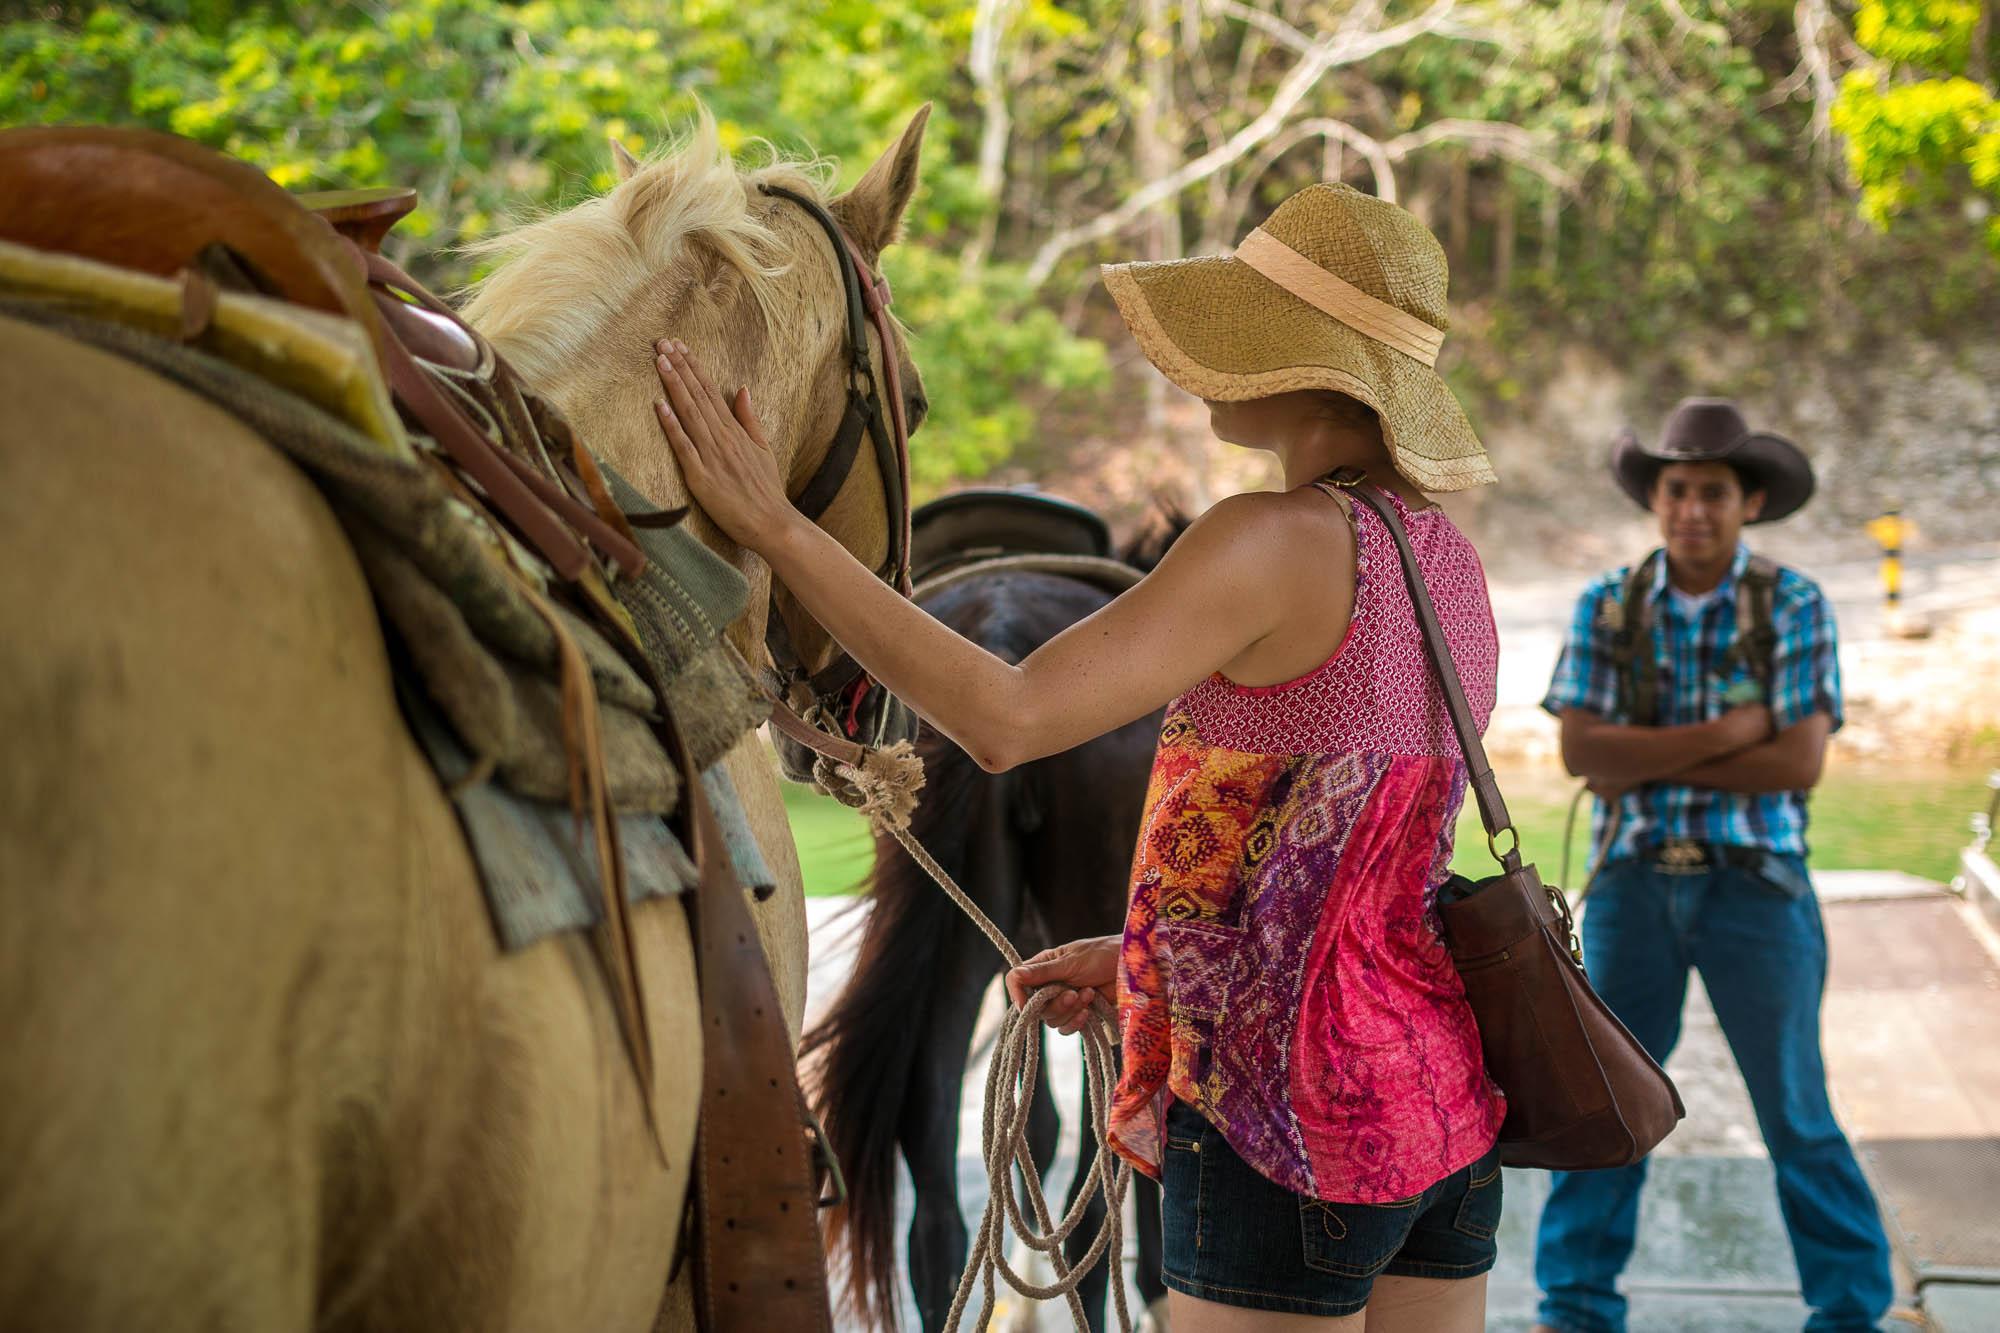 Xunantunich-Belize-horesback-riding-7.jpg